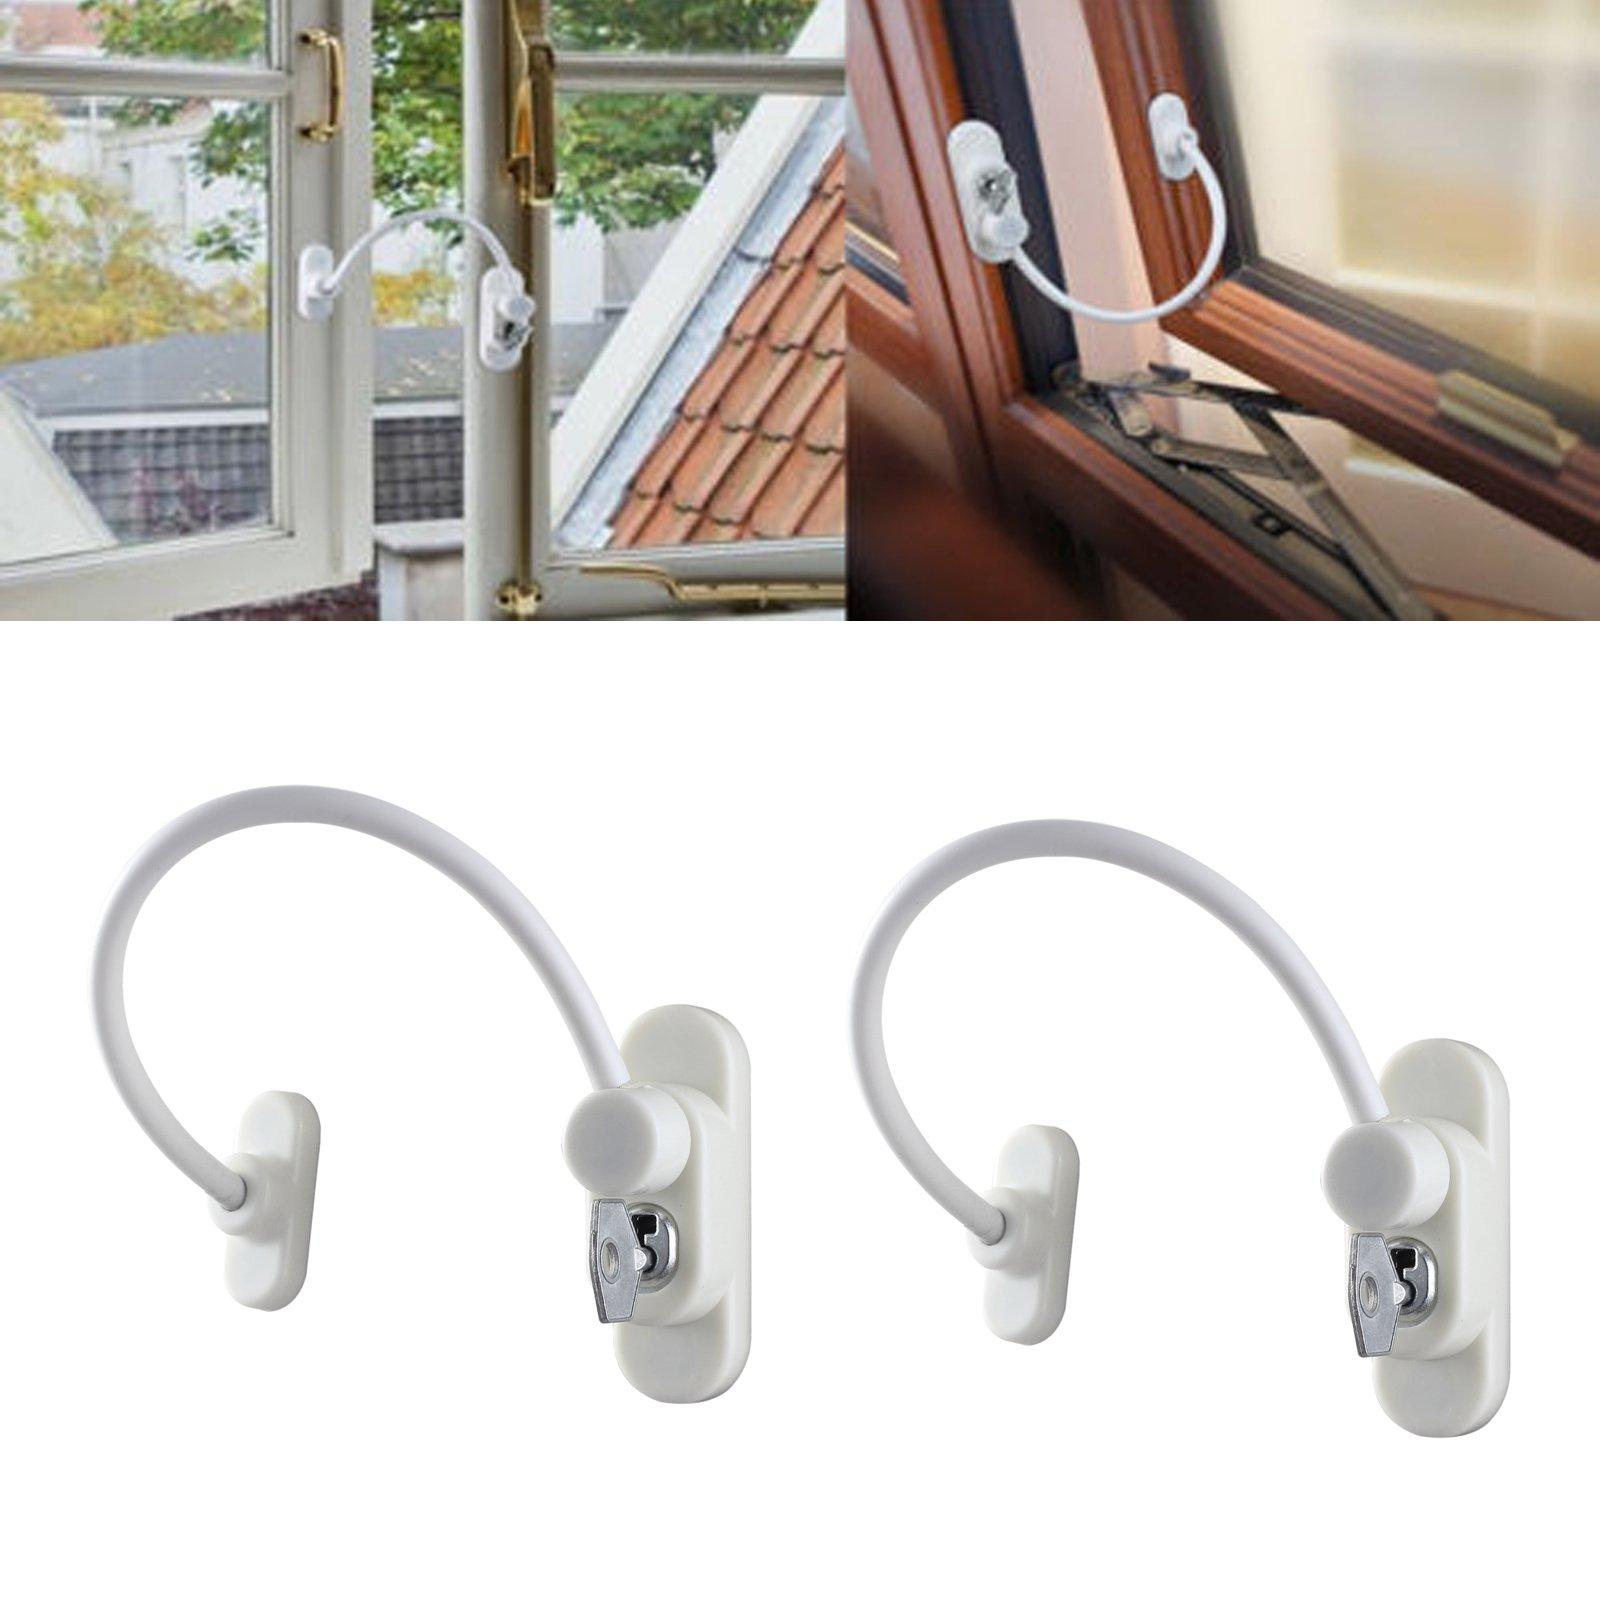 AUTOUTLET 2PCS Safety UPVC Window Restrictor Cable Lock Wire Kids Child Security locks Locked & Unlocked + Release Key